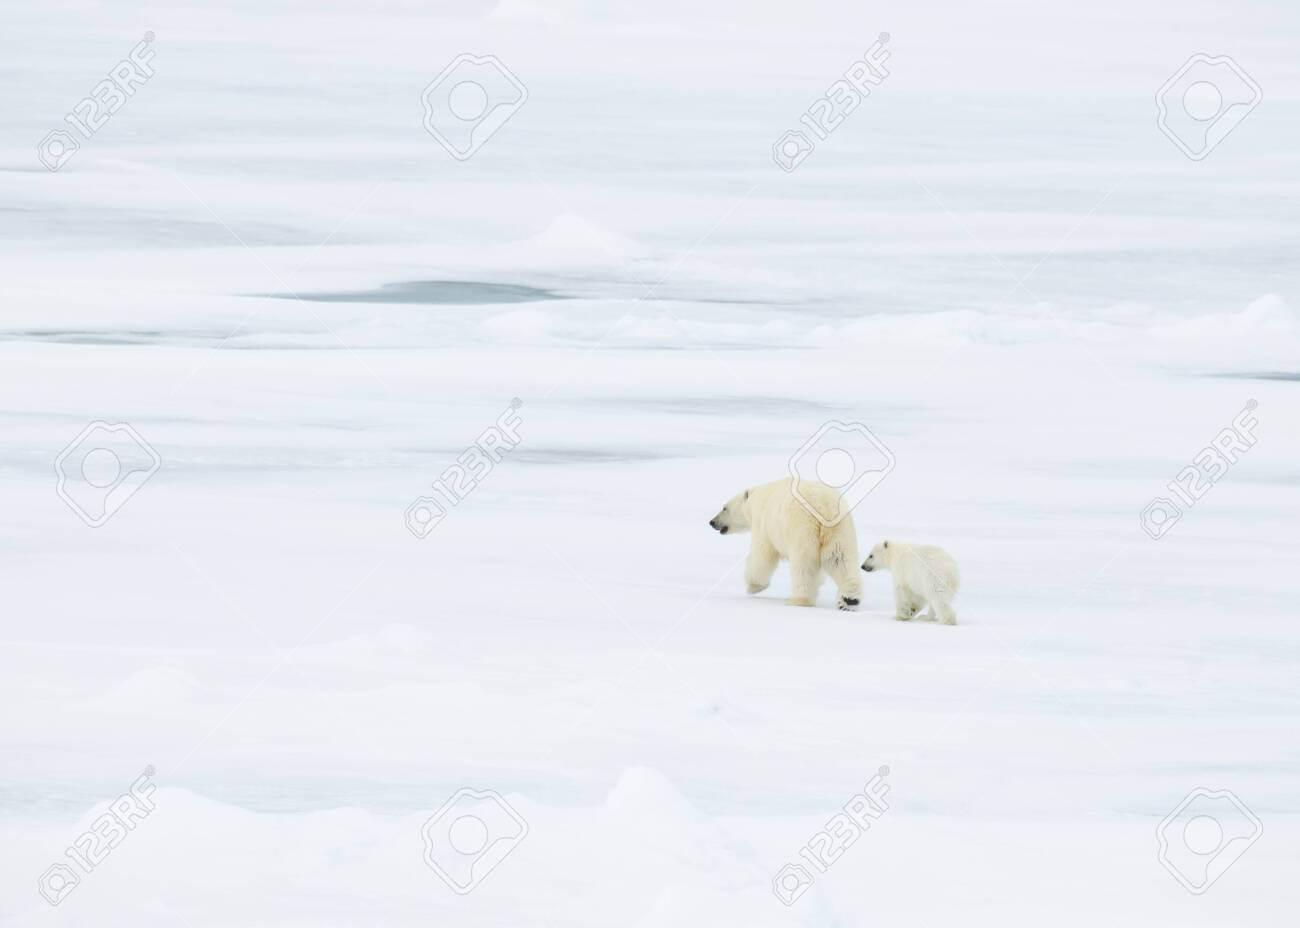 Polar bear with cub walking in an arctic landscape. - 121118008